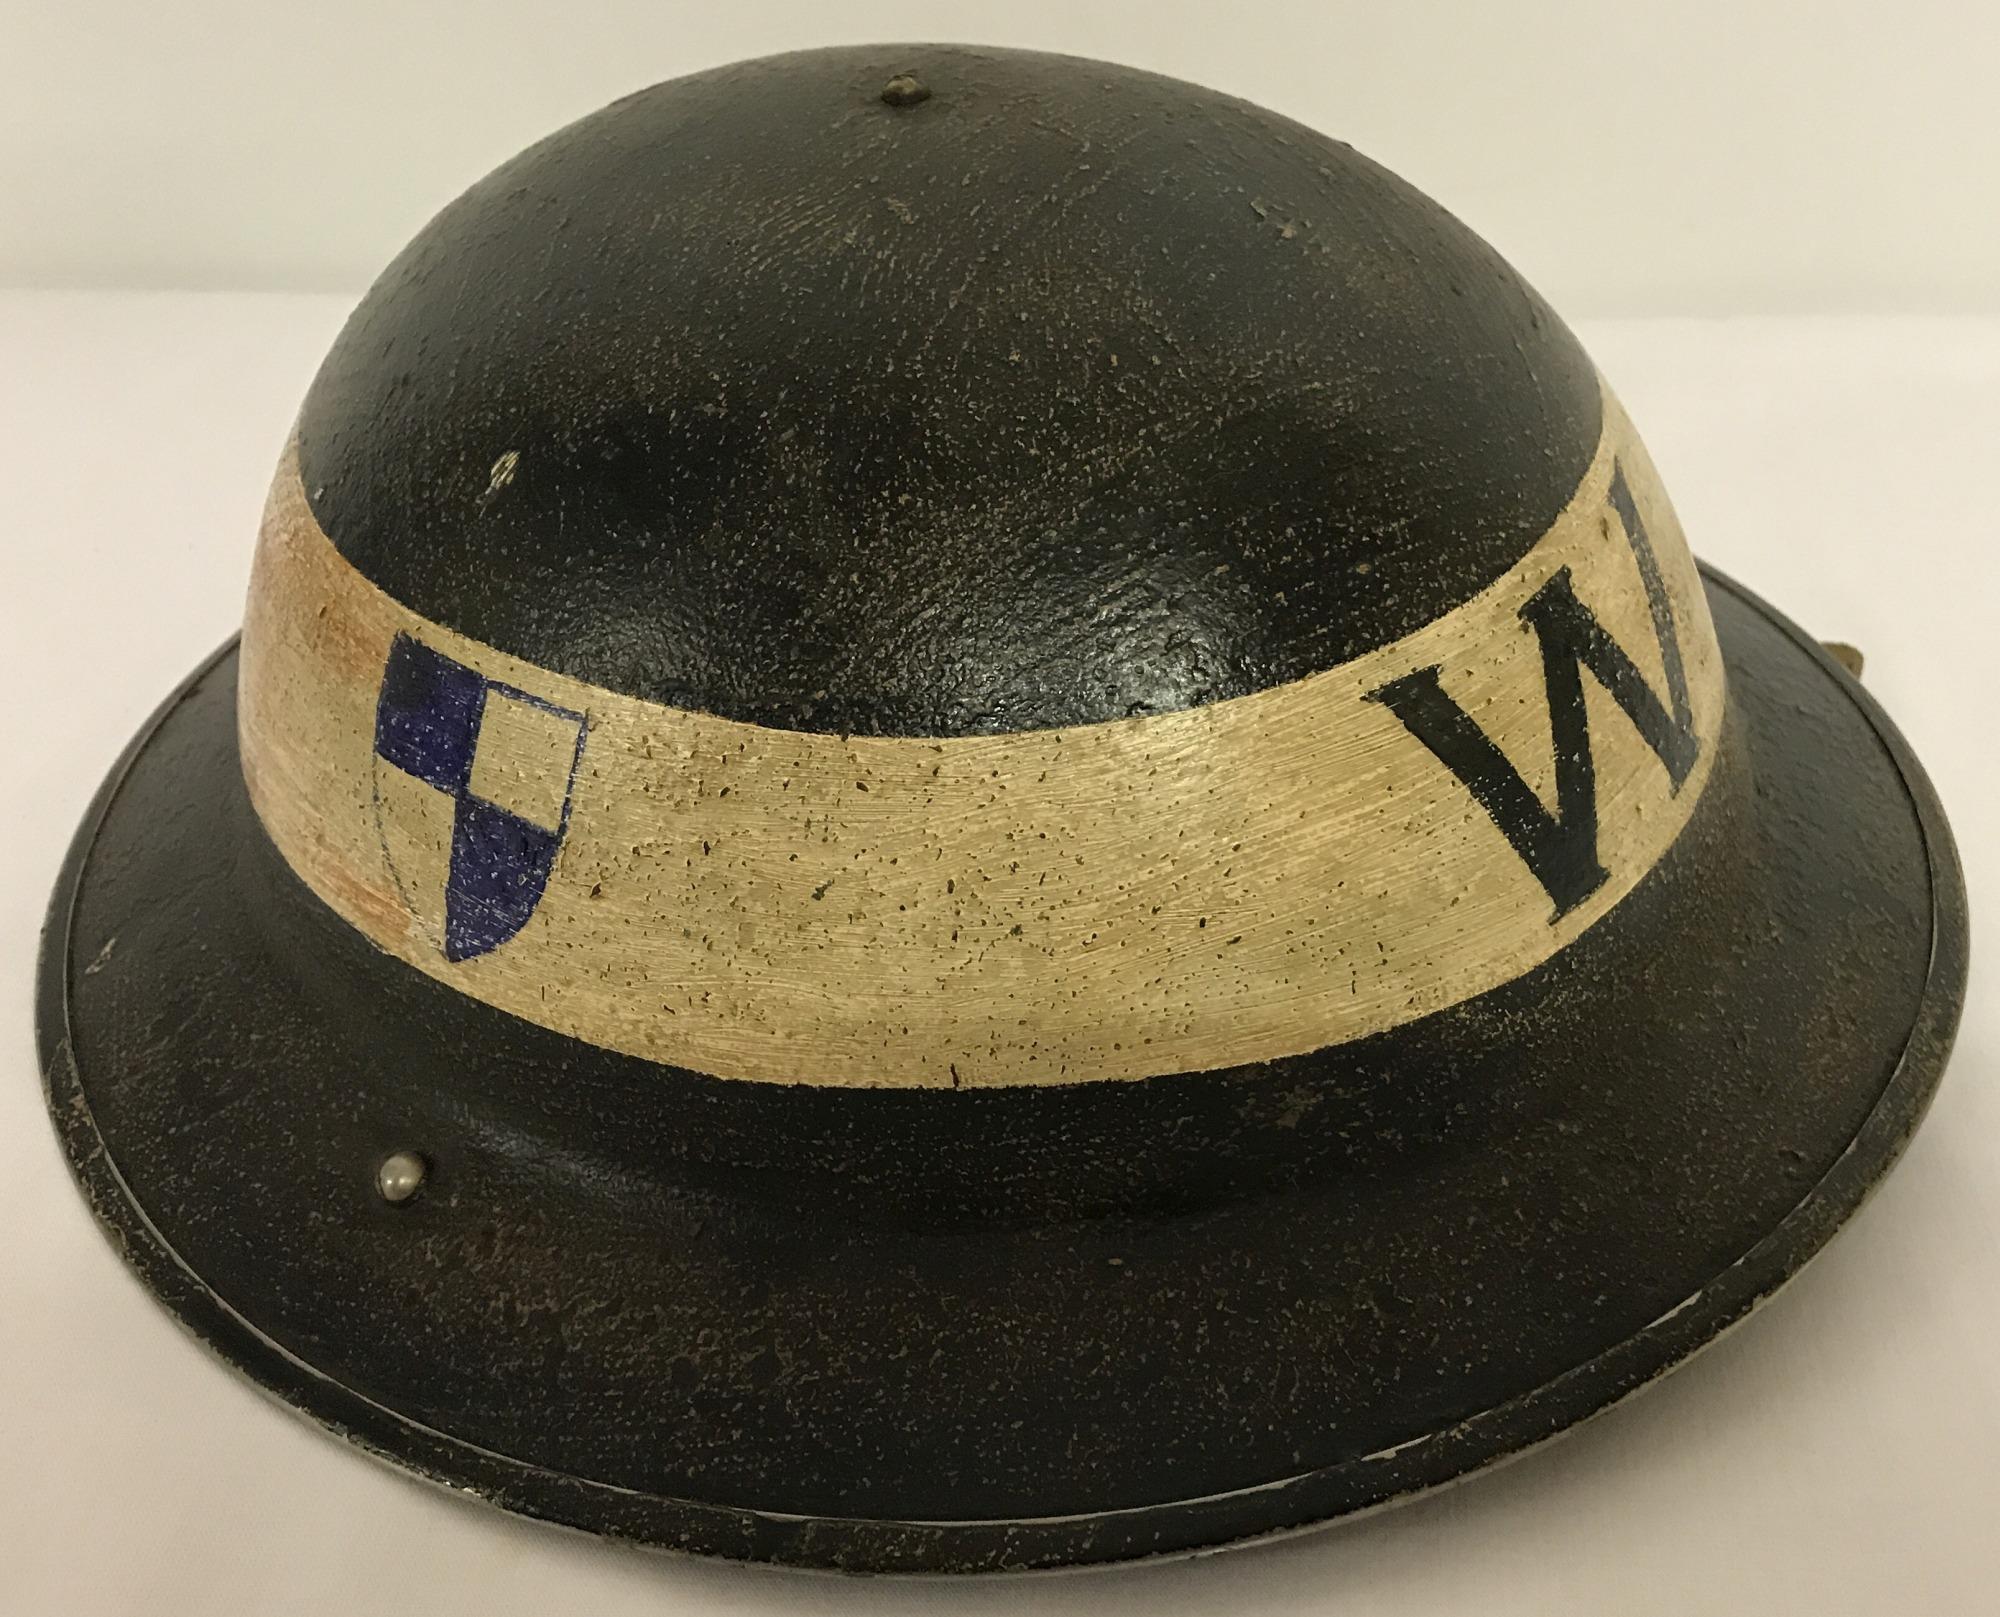 A British MK II Civil Defence/Home Front steel helmet c1939.